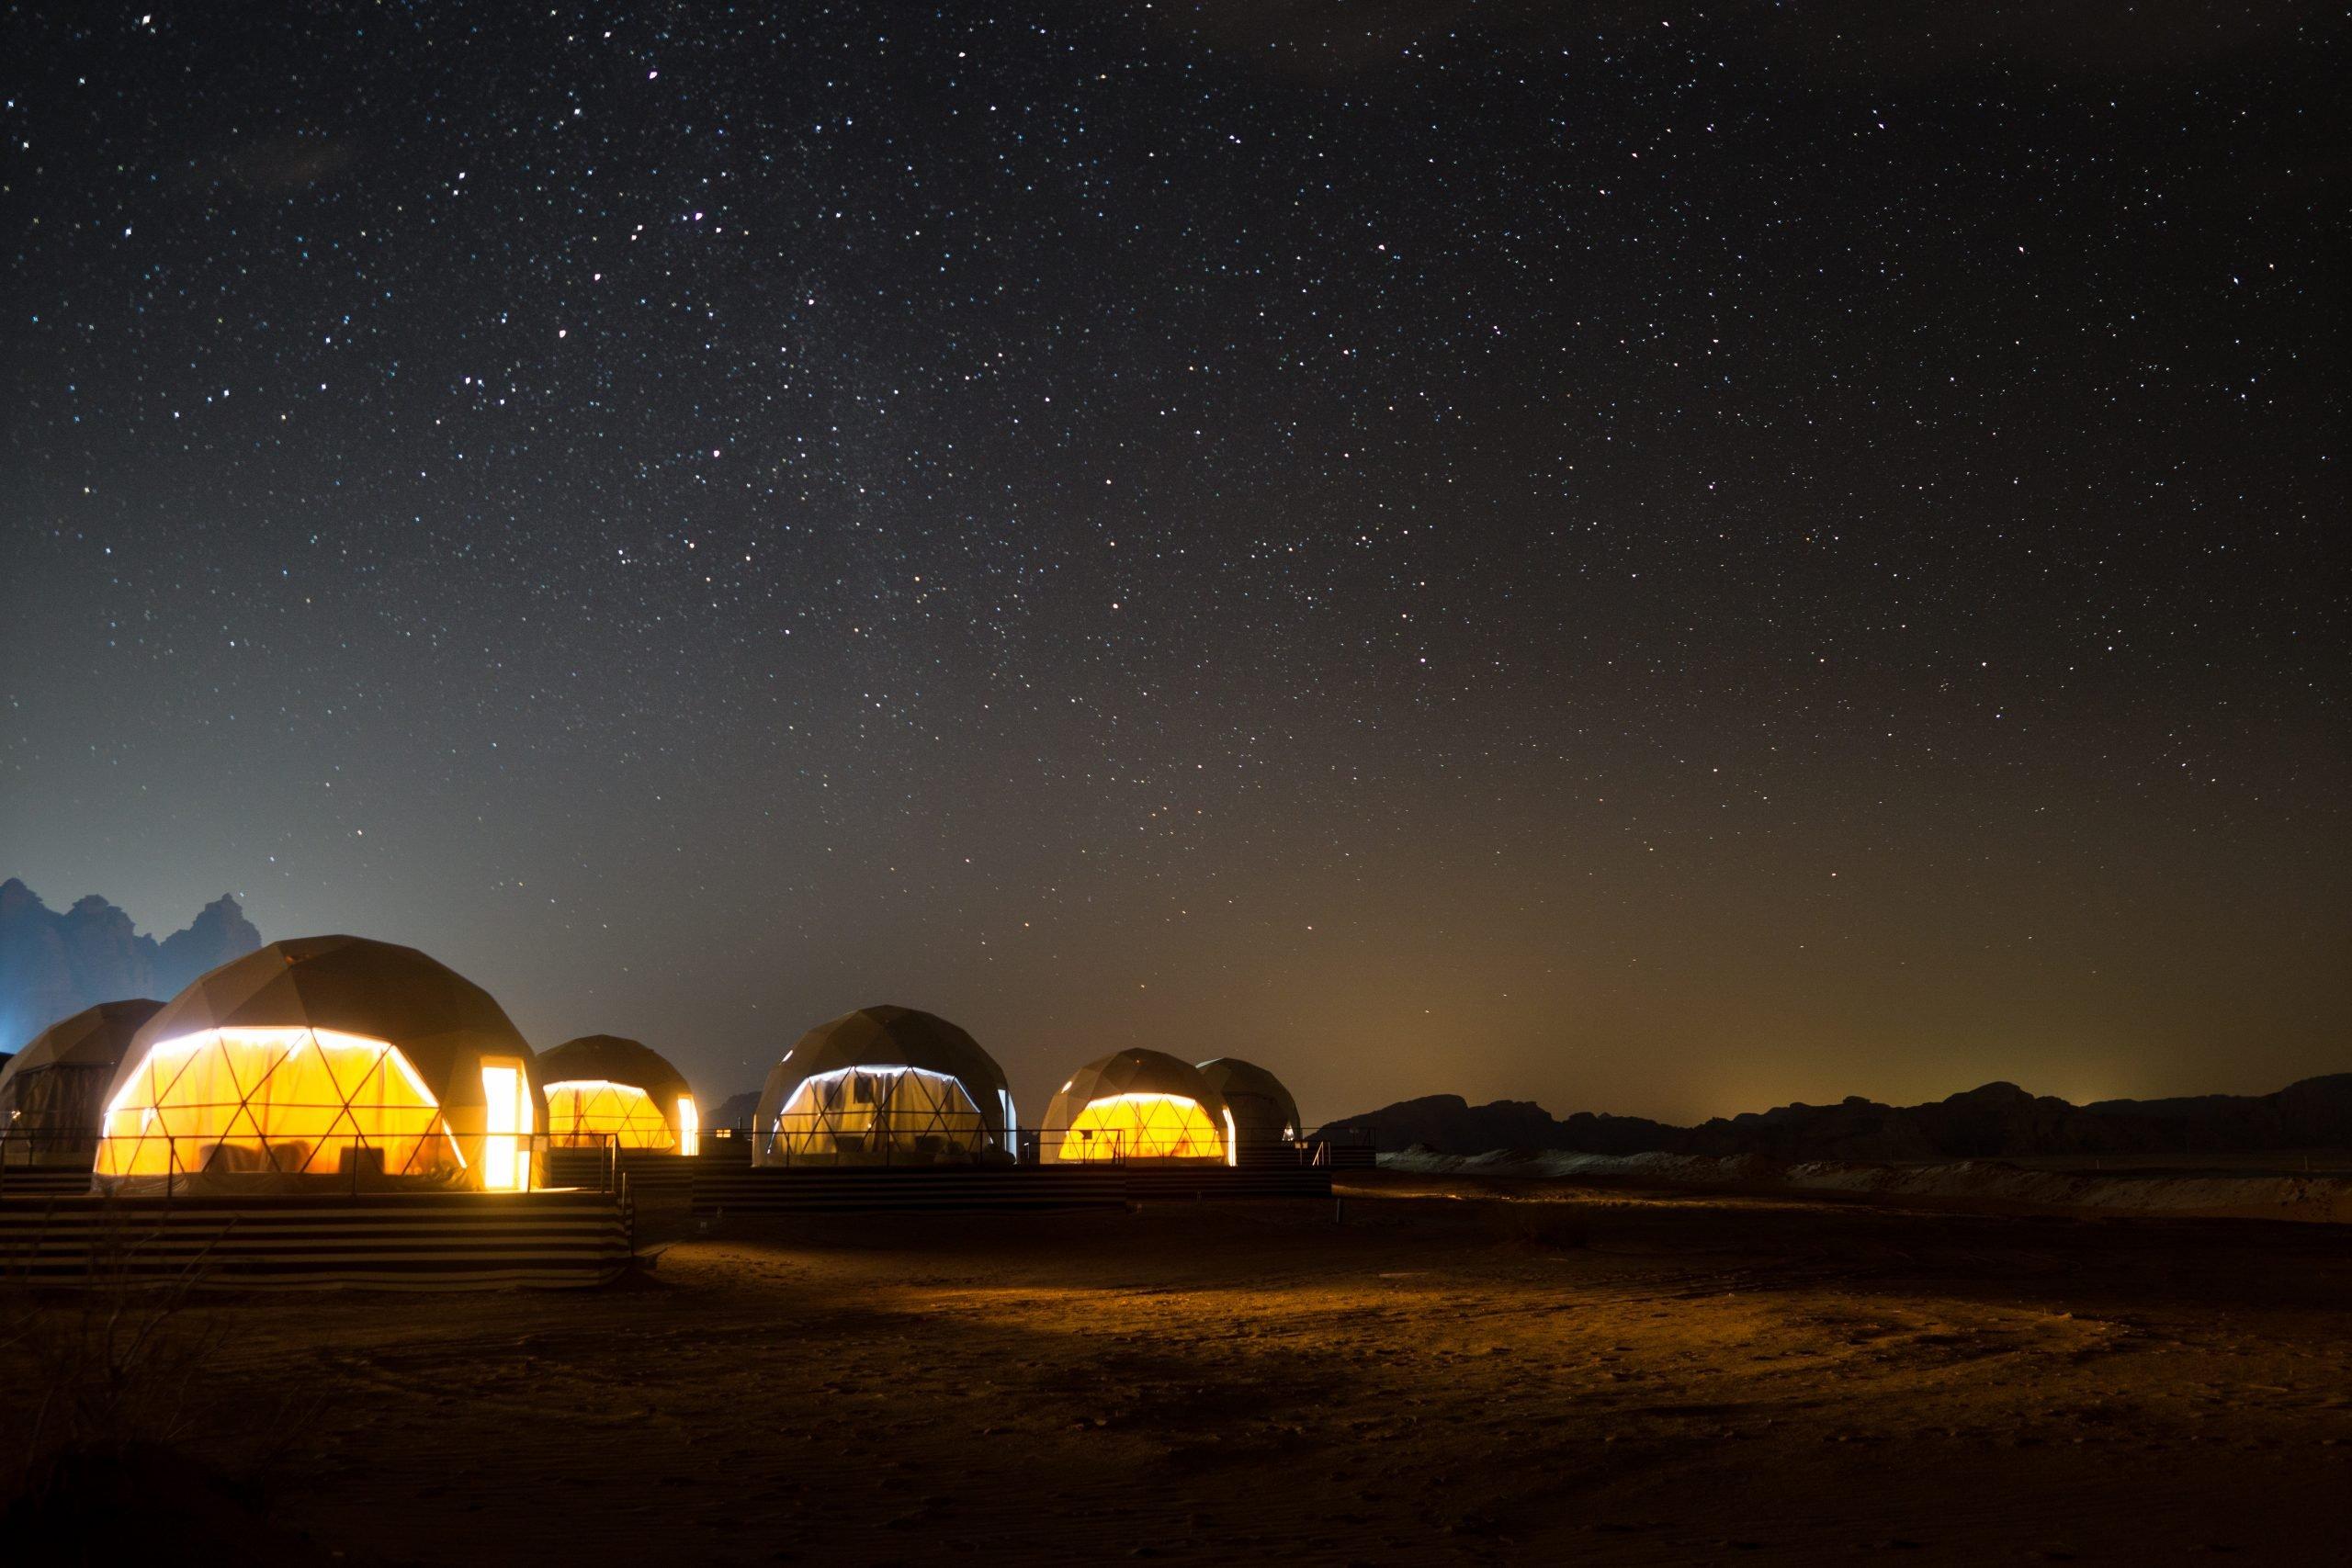 Overnight In Martian Tent In Wadi Rum